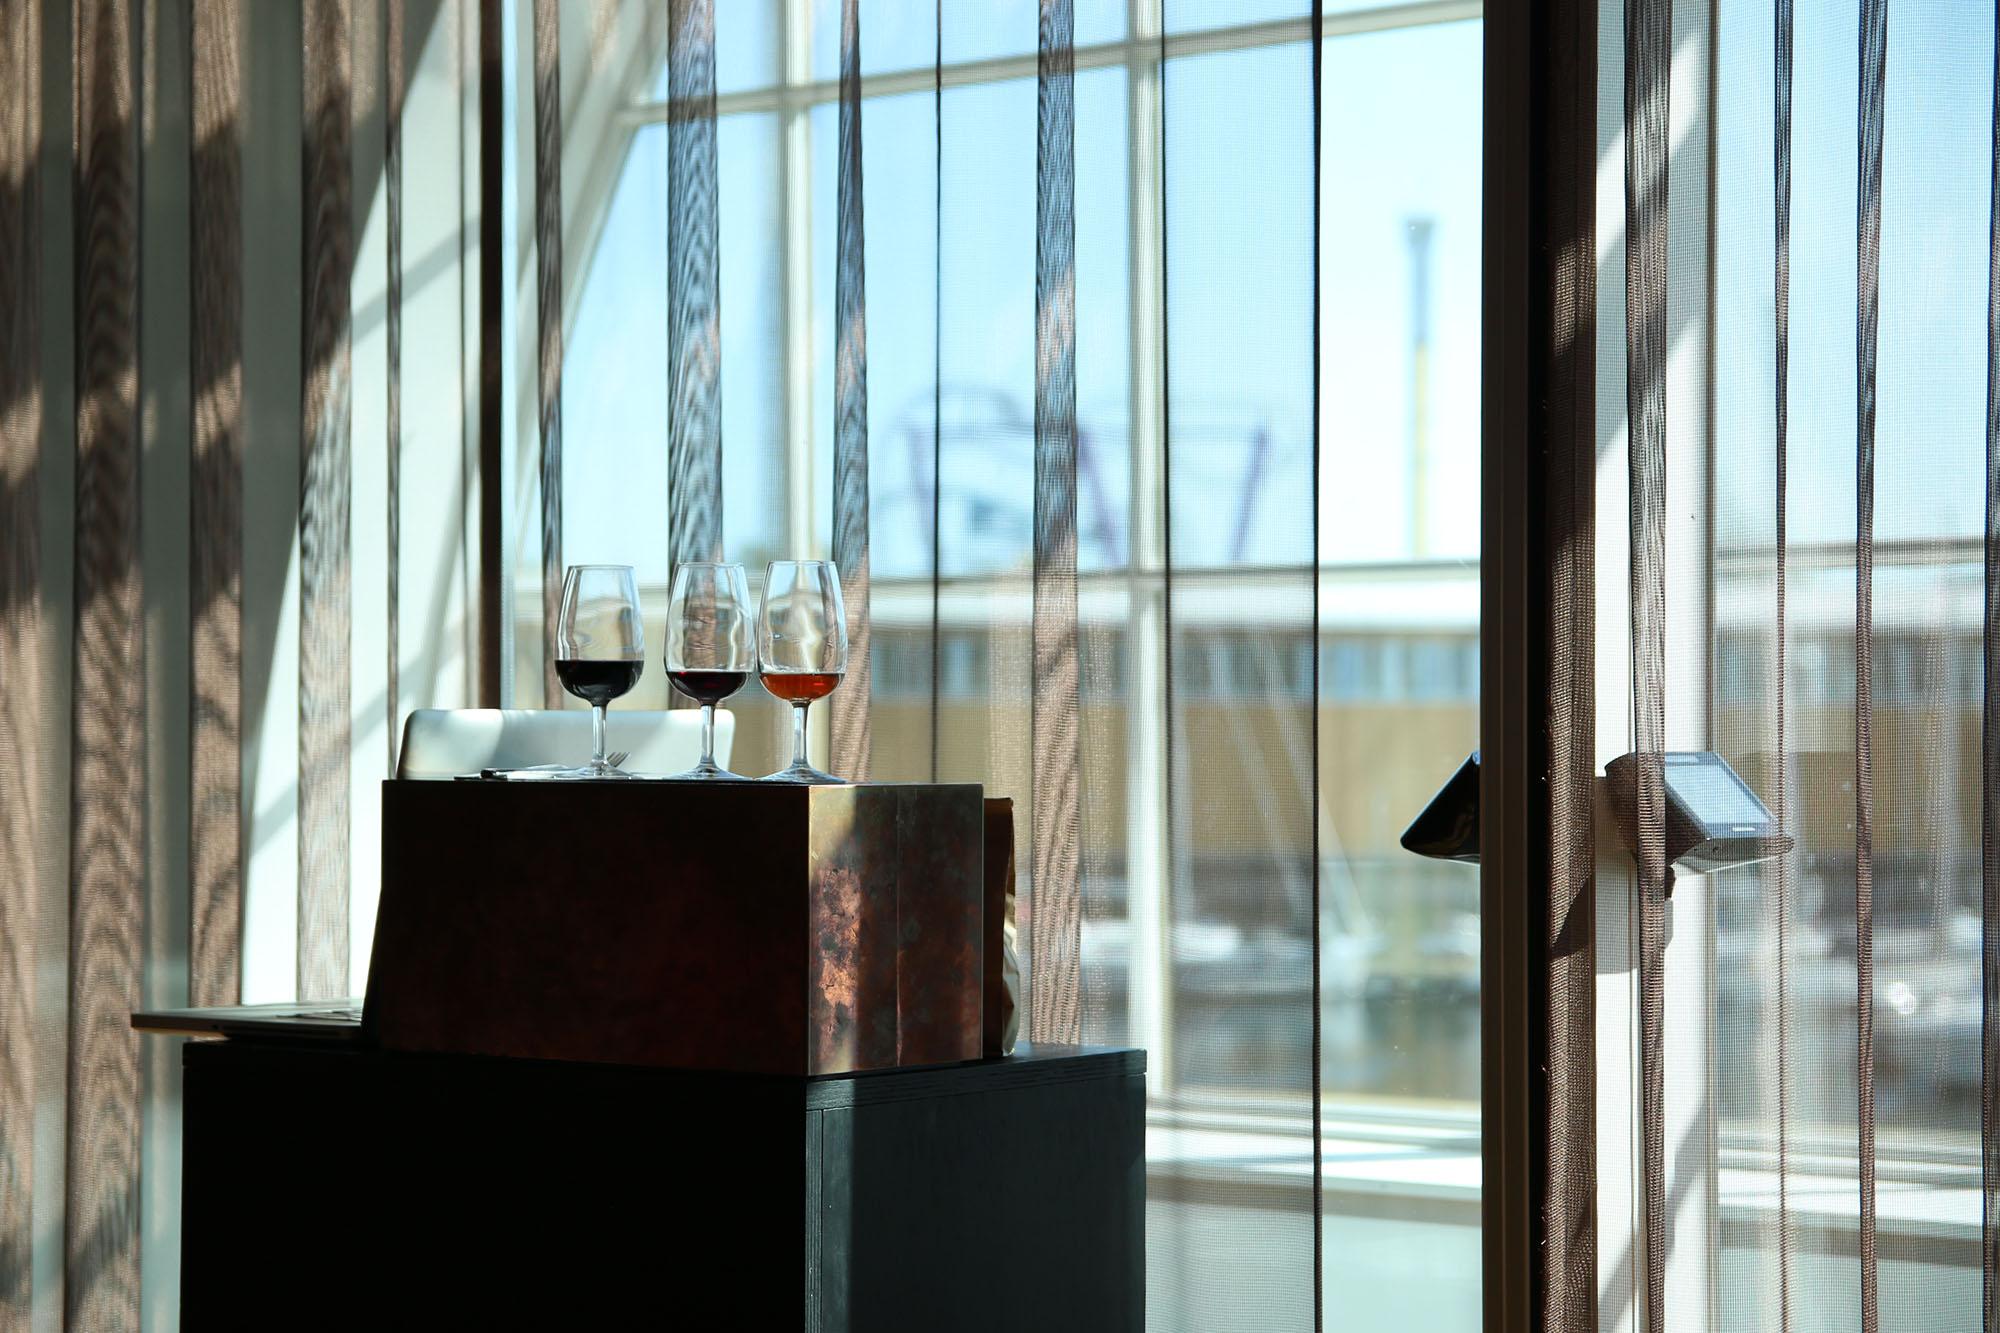 IMG_2887 spritmuseet vinprovning x